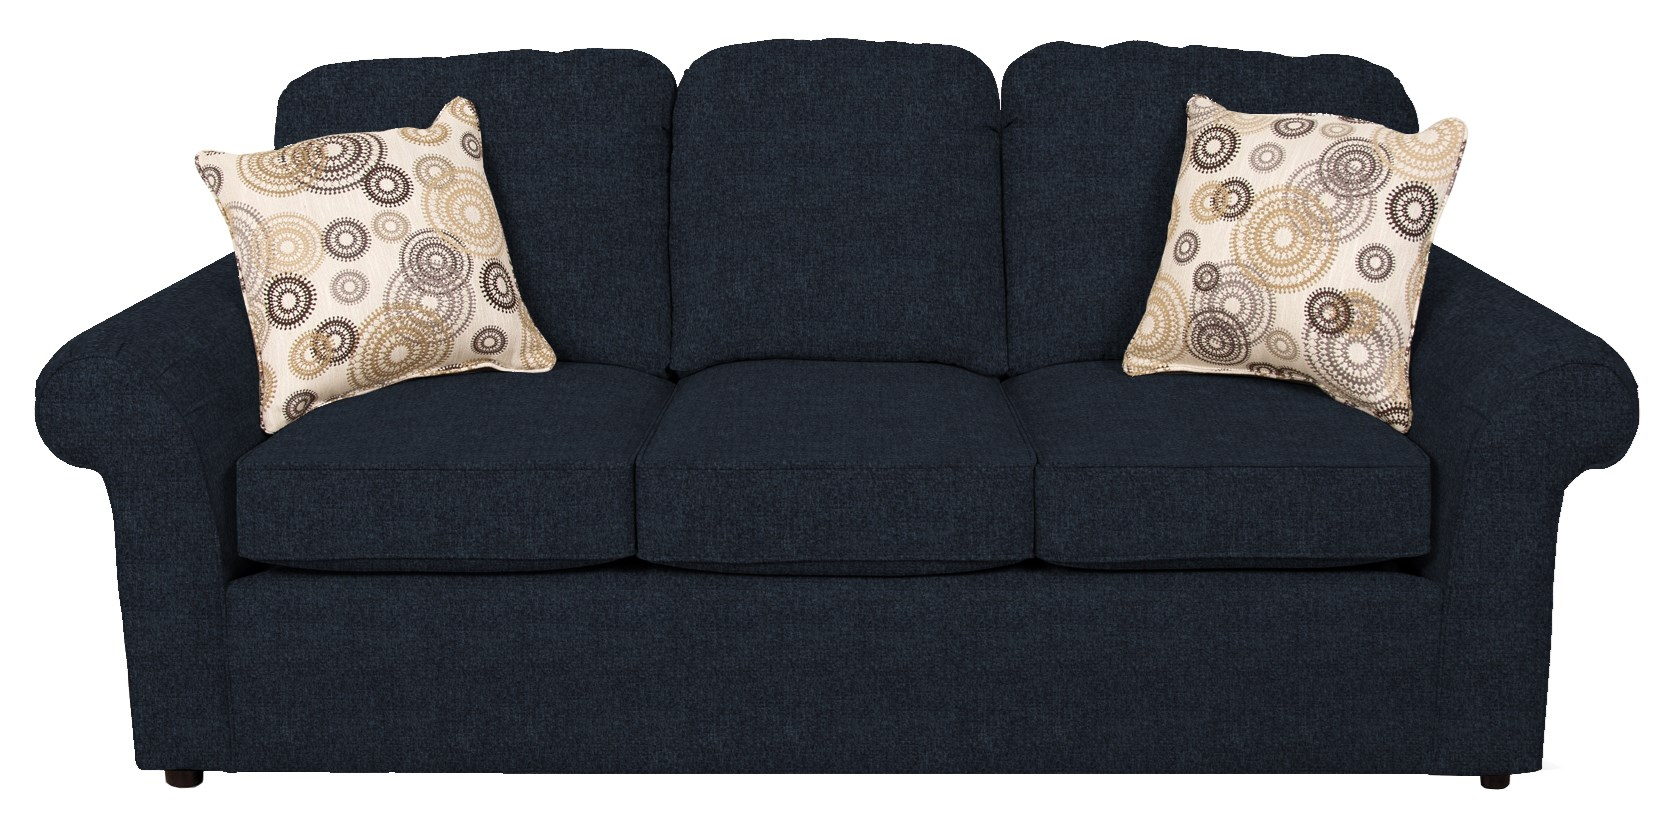 Malibu Air Sleeper by England at Coconis Furniture & Mattress 1st